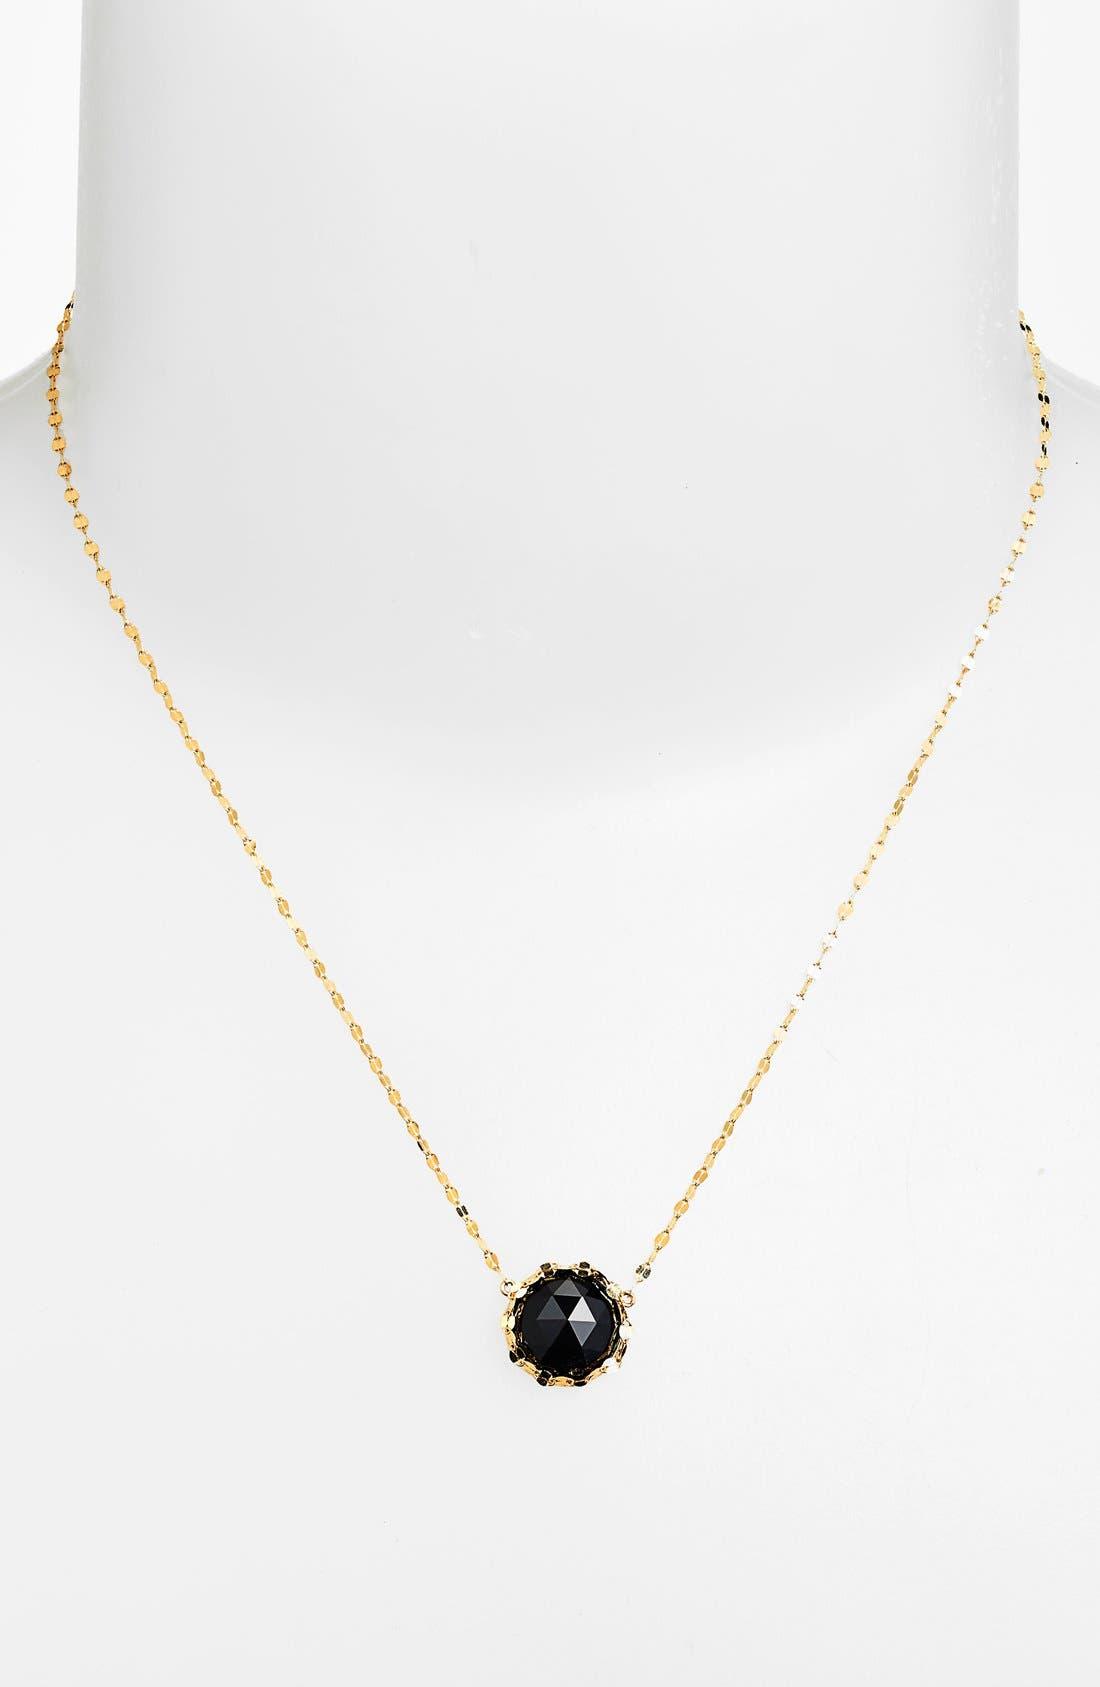 Main Image - Lana Jewelry Stone Pendant Necklace